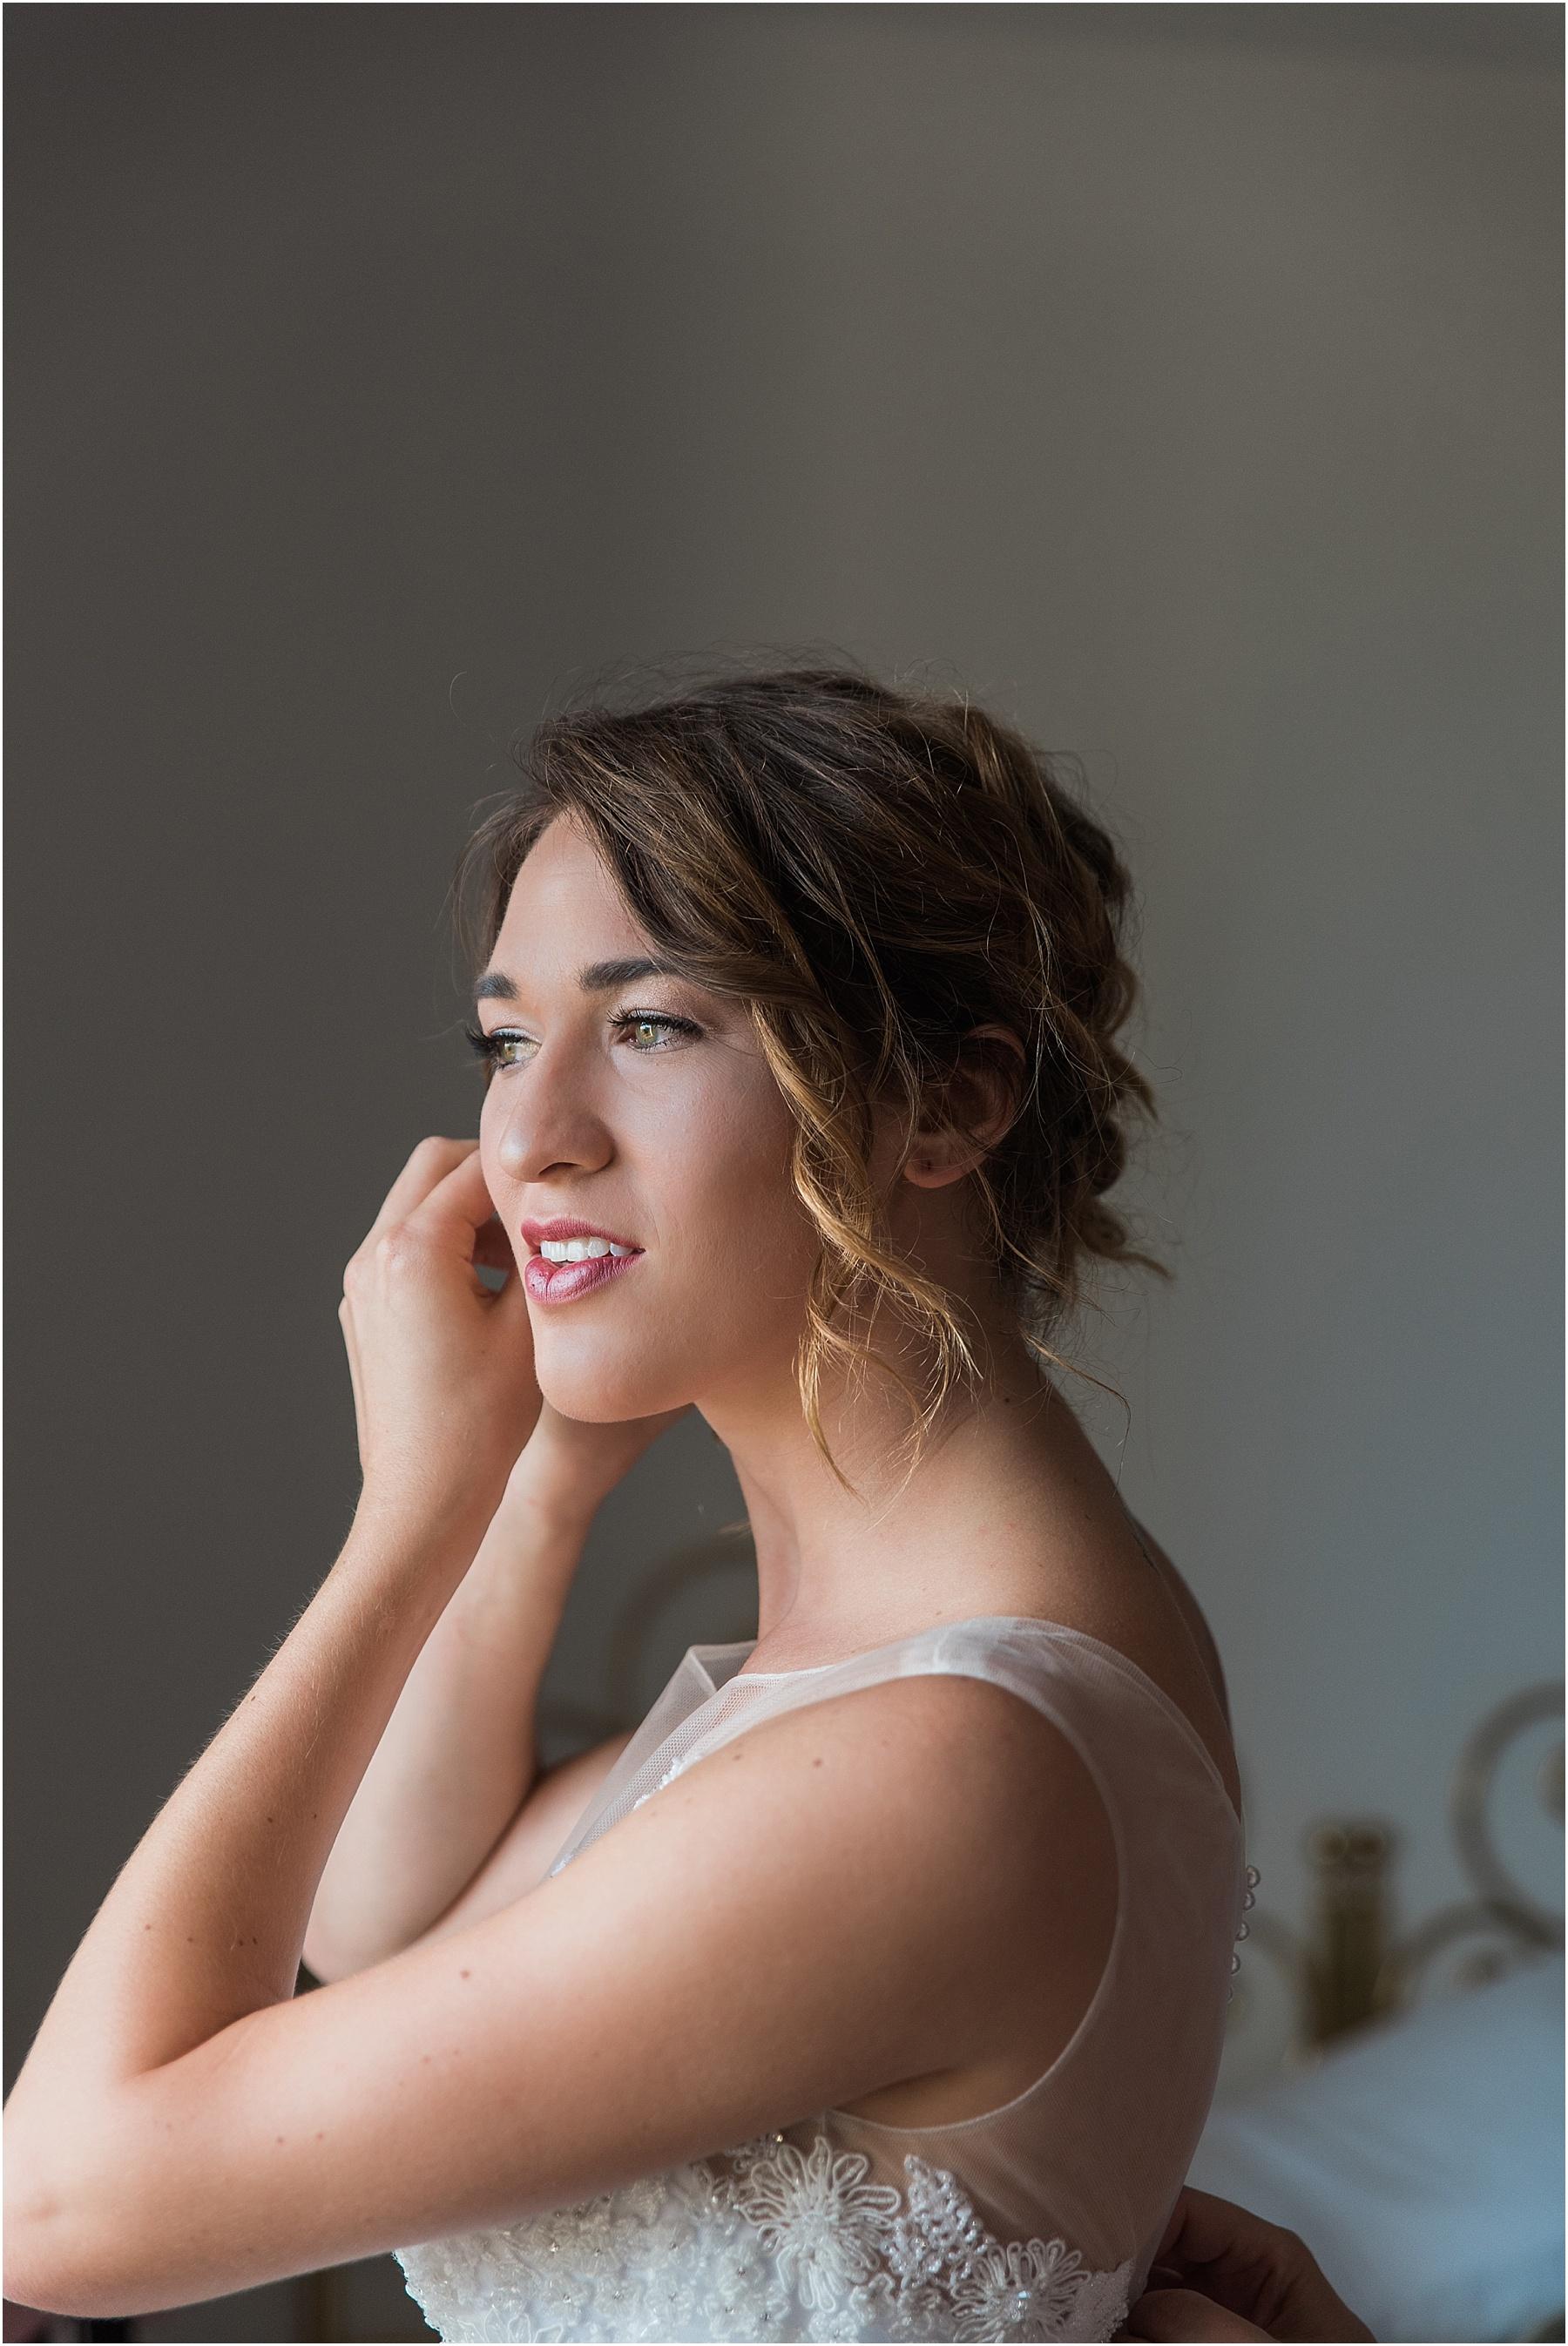 cortona italy tuscan arrezzo bride putting on her earrings and smiling beautiful window light